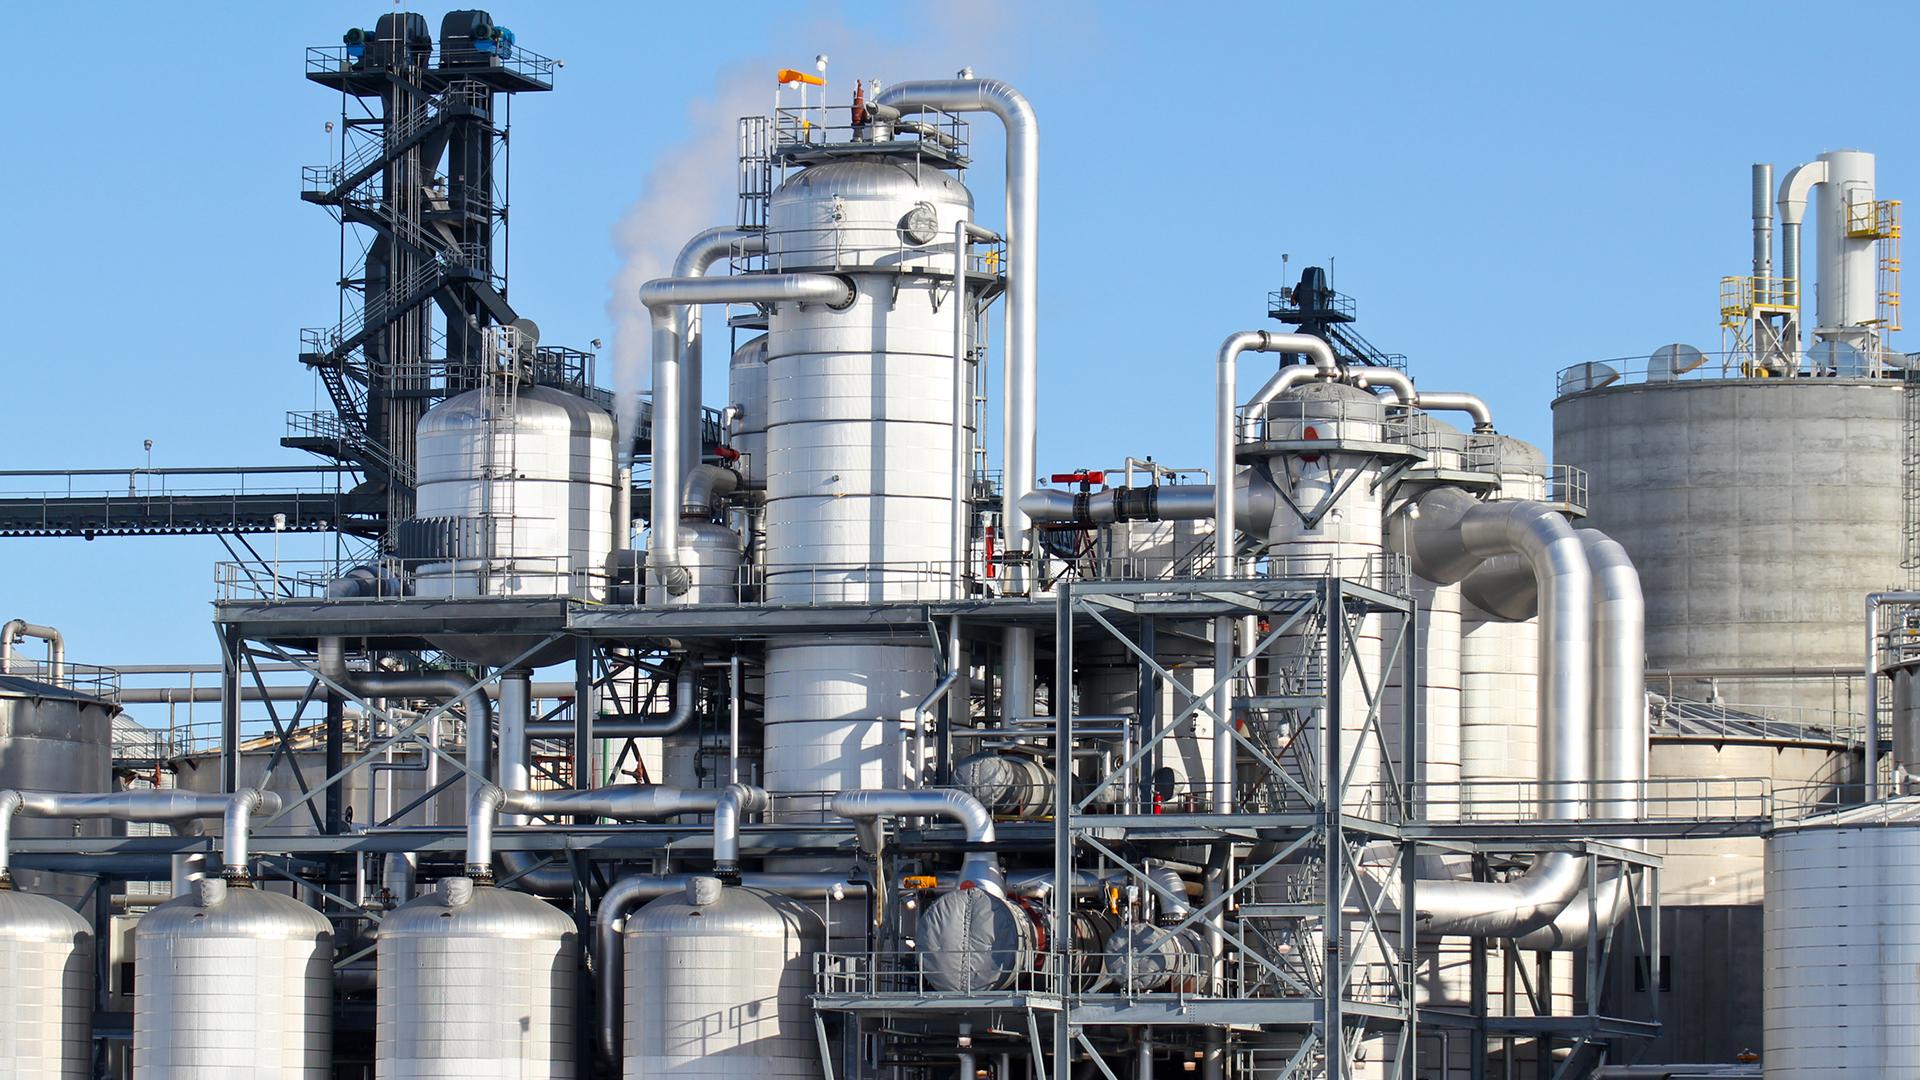 Refinery process plant 1